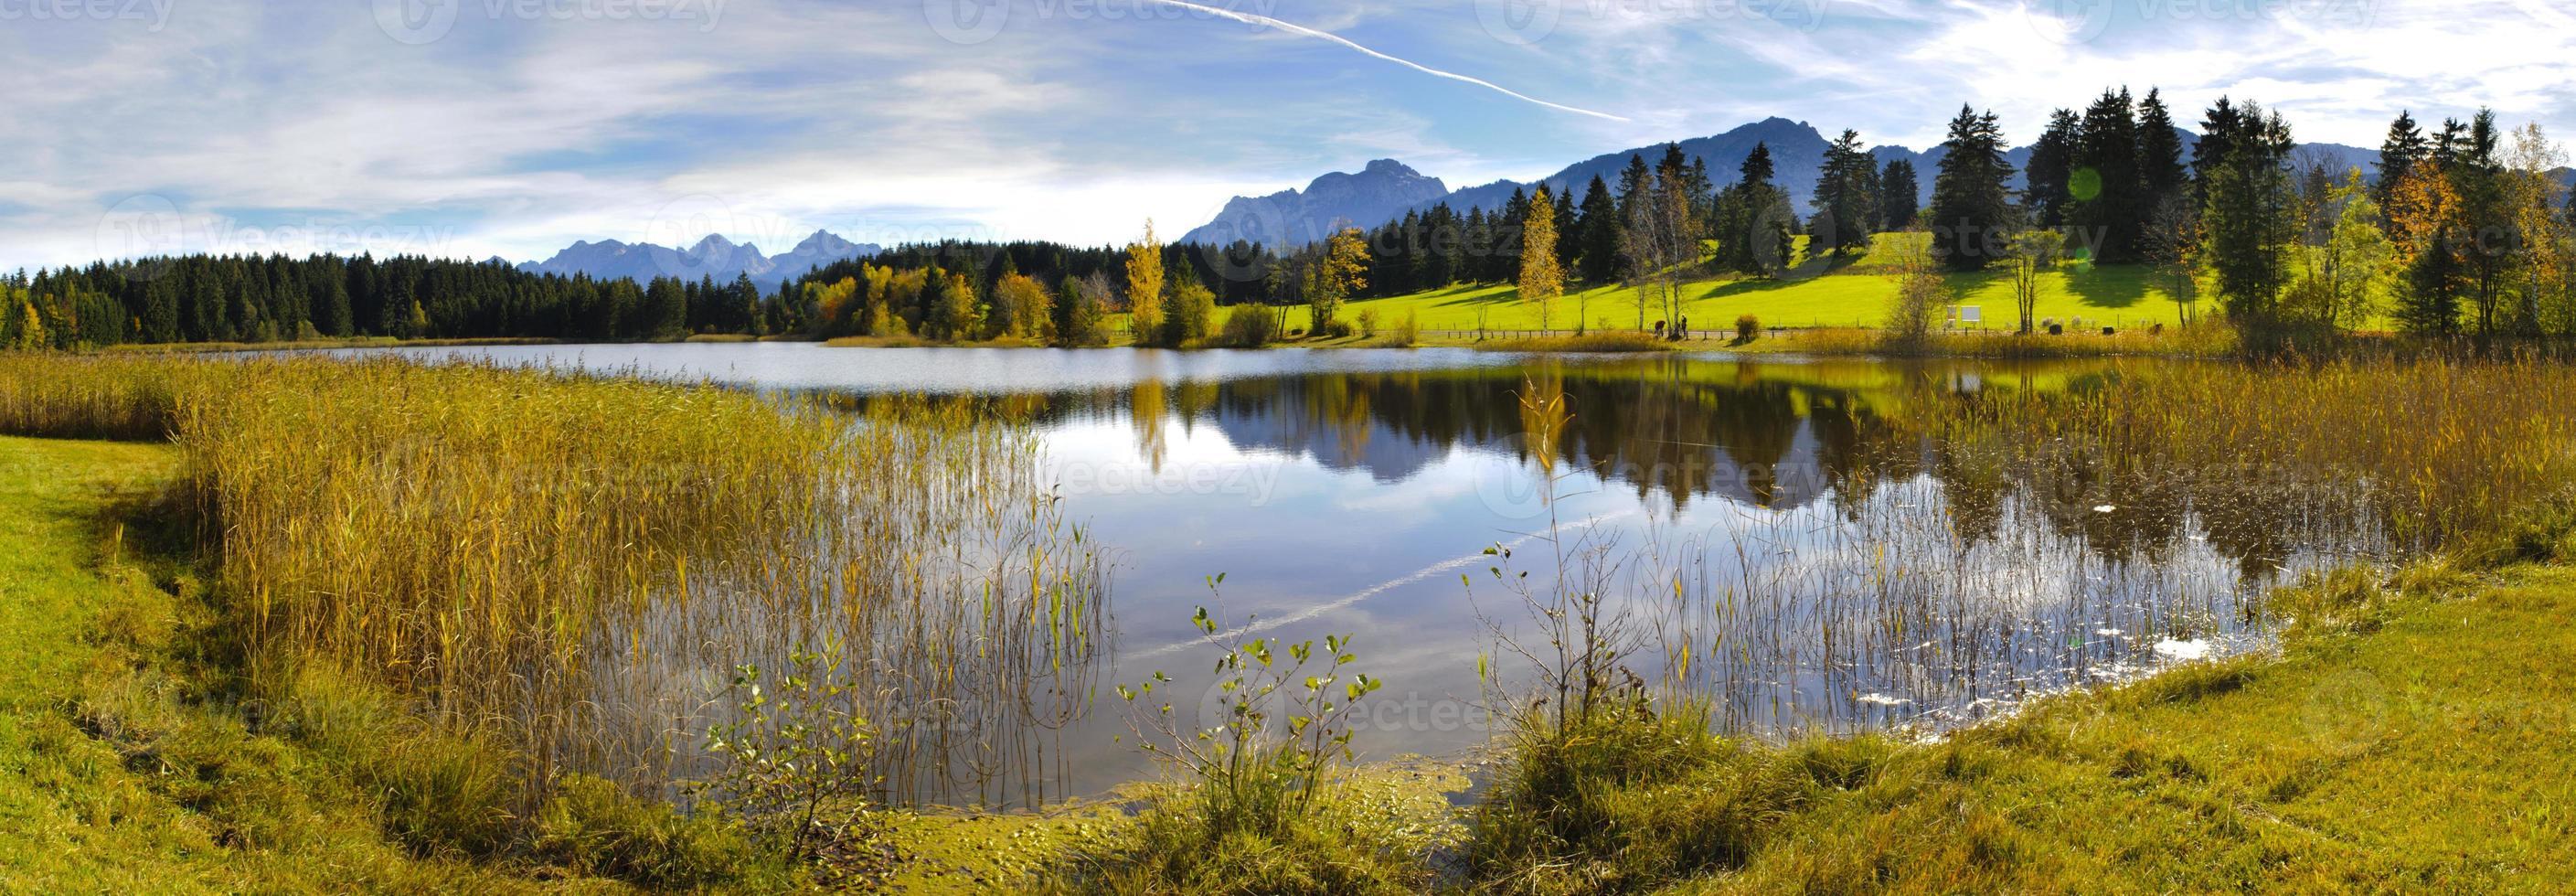 paisagem panorama na Baviera foto